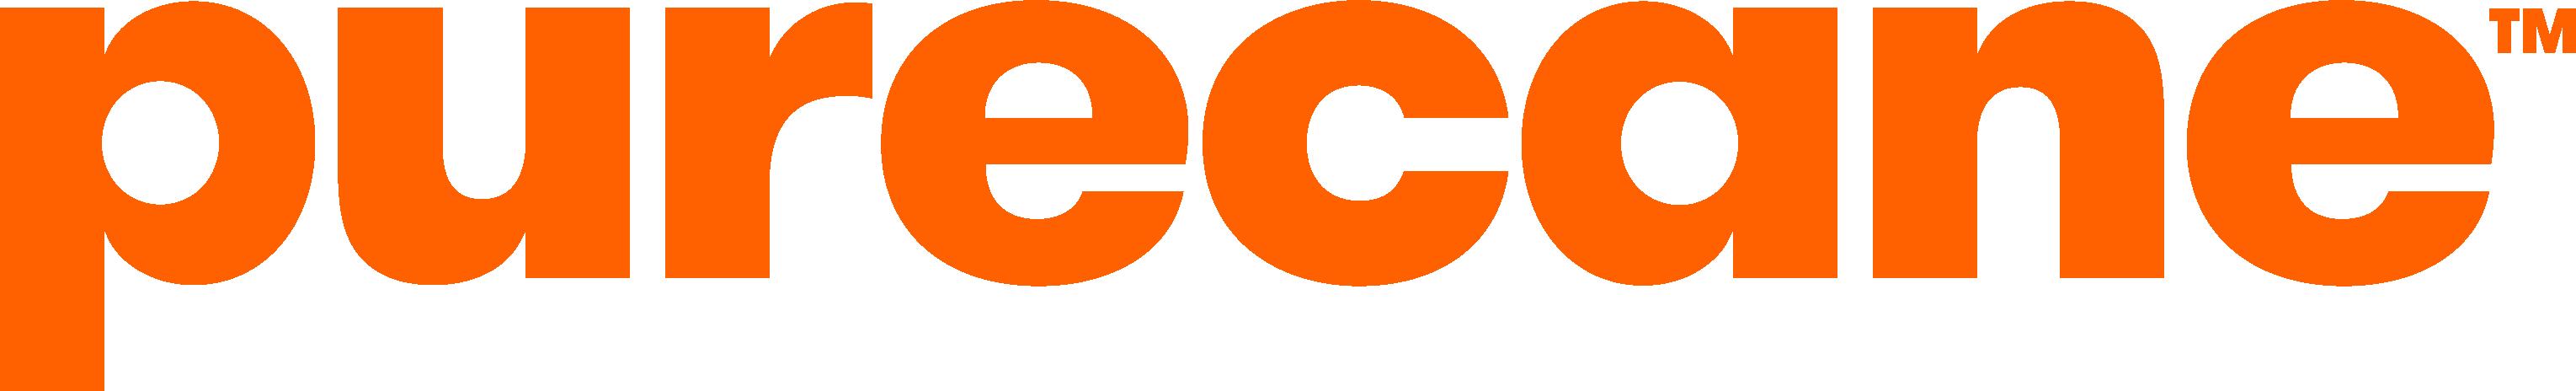 purecane - sponsoring BevNET Live Winter 2019